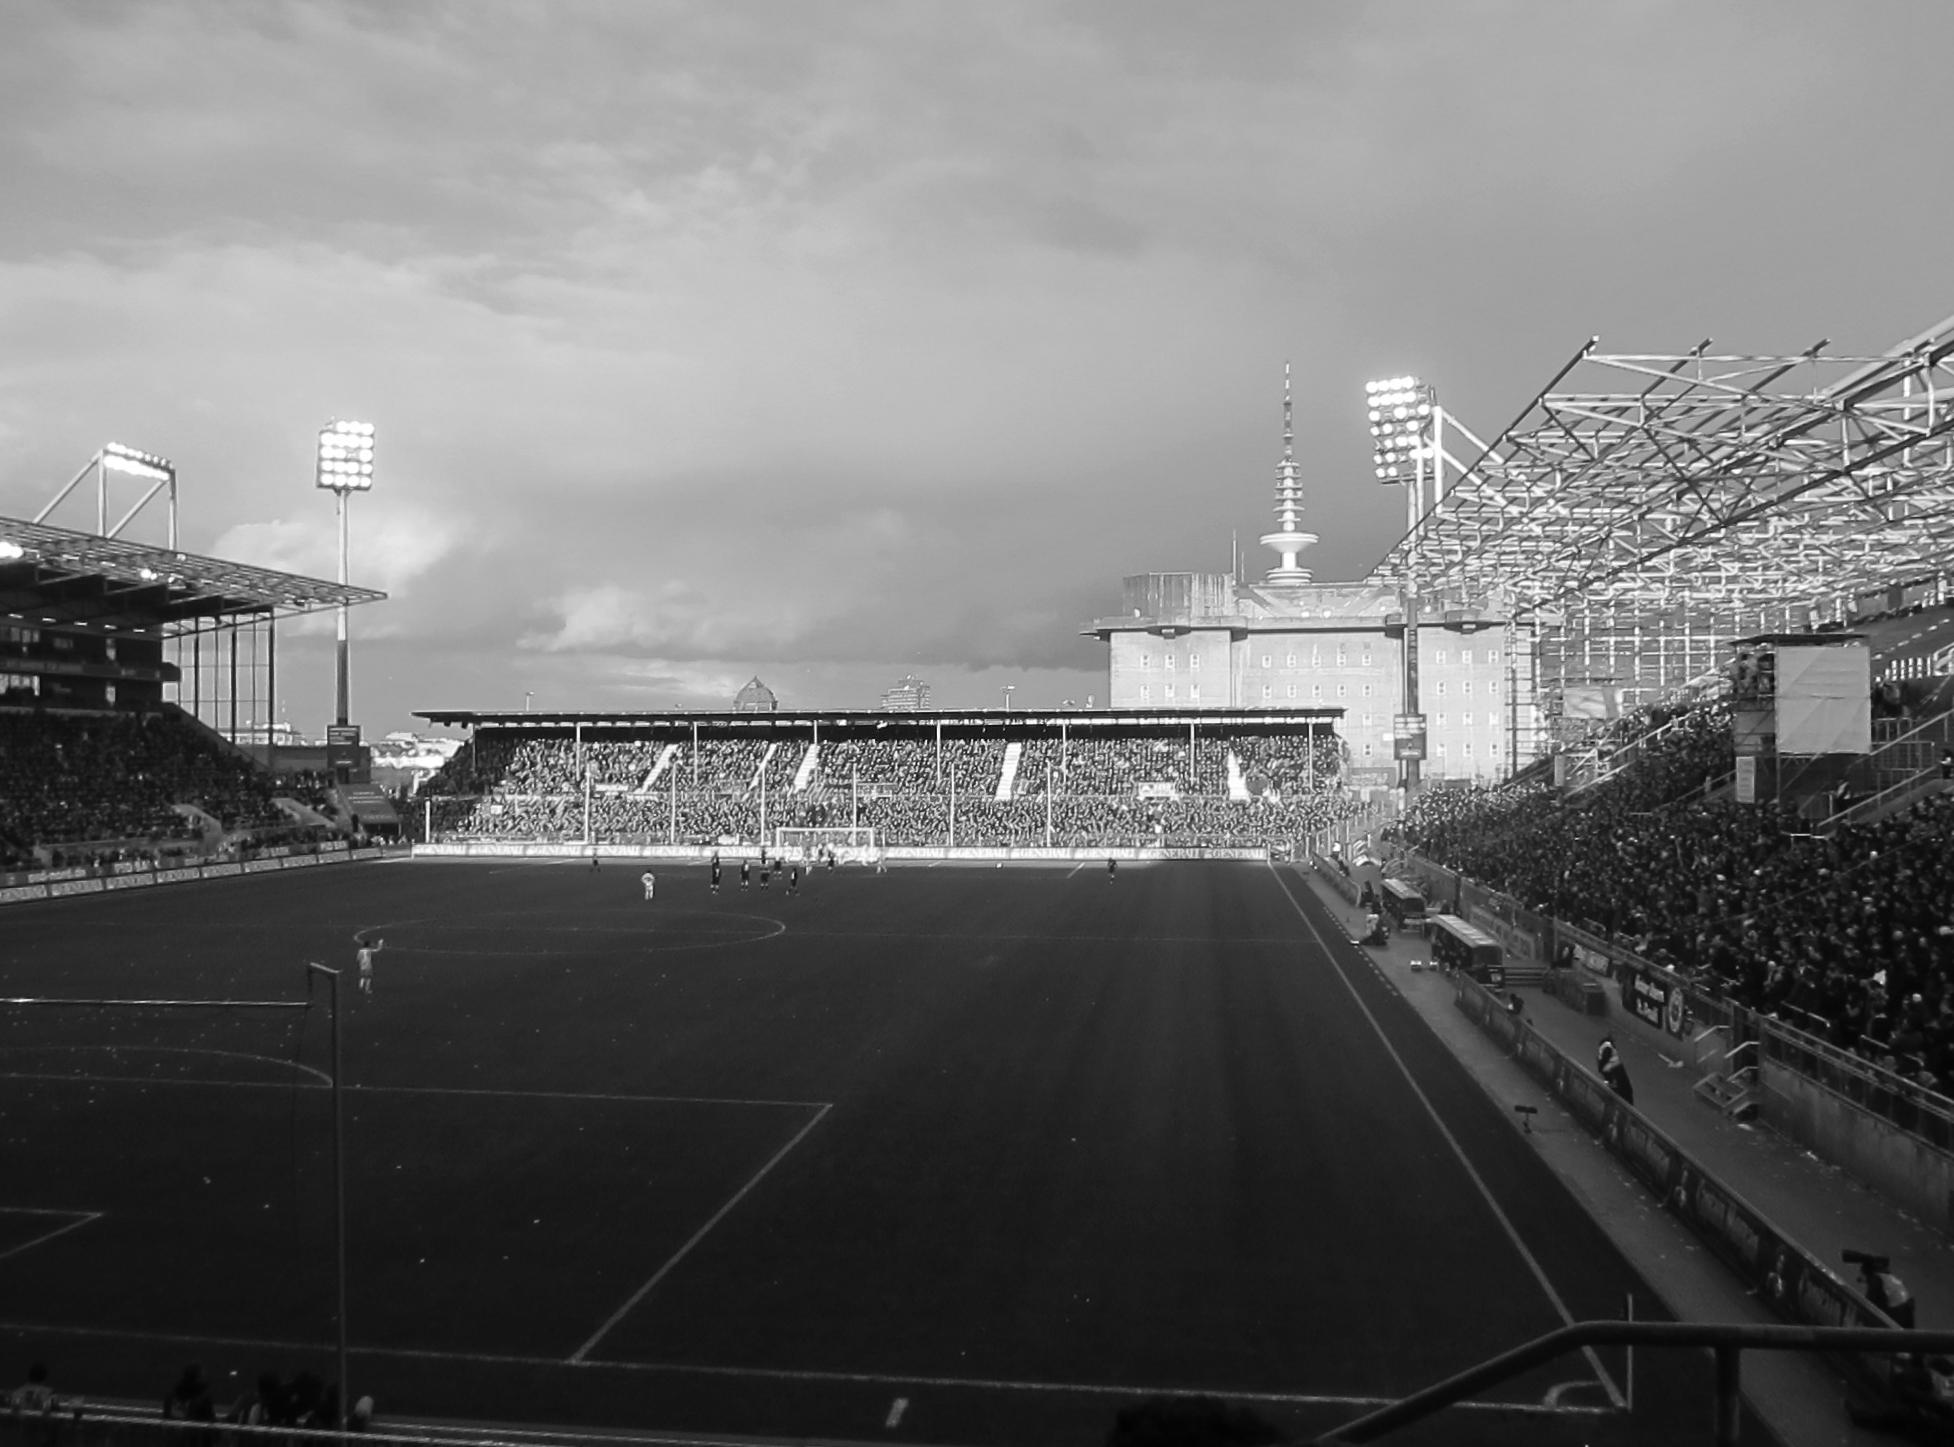 stadion-st-pauli-hamburg